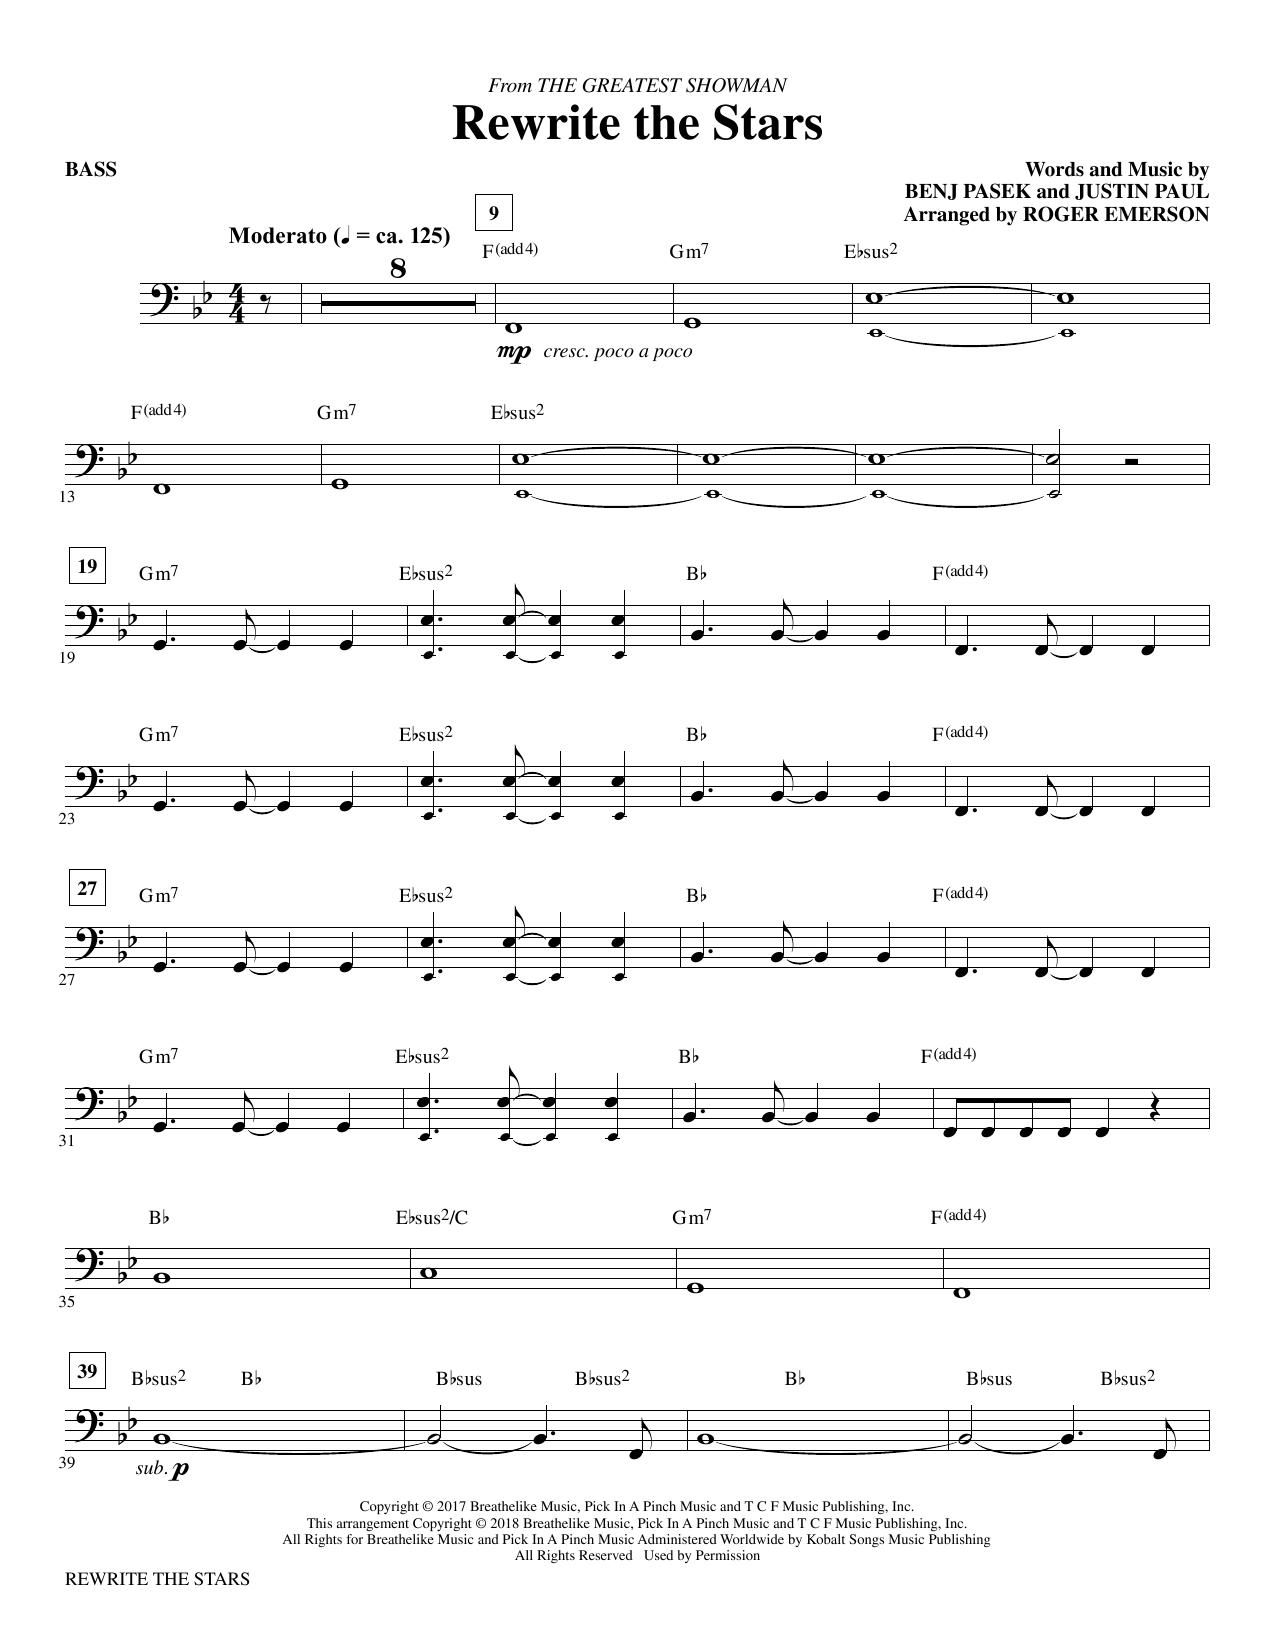 Pasek & Paul Rewrite The Stars (arr. Roger Emerson) - Bass sheet music notes printable PDF score